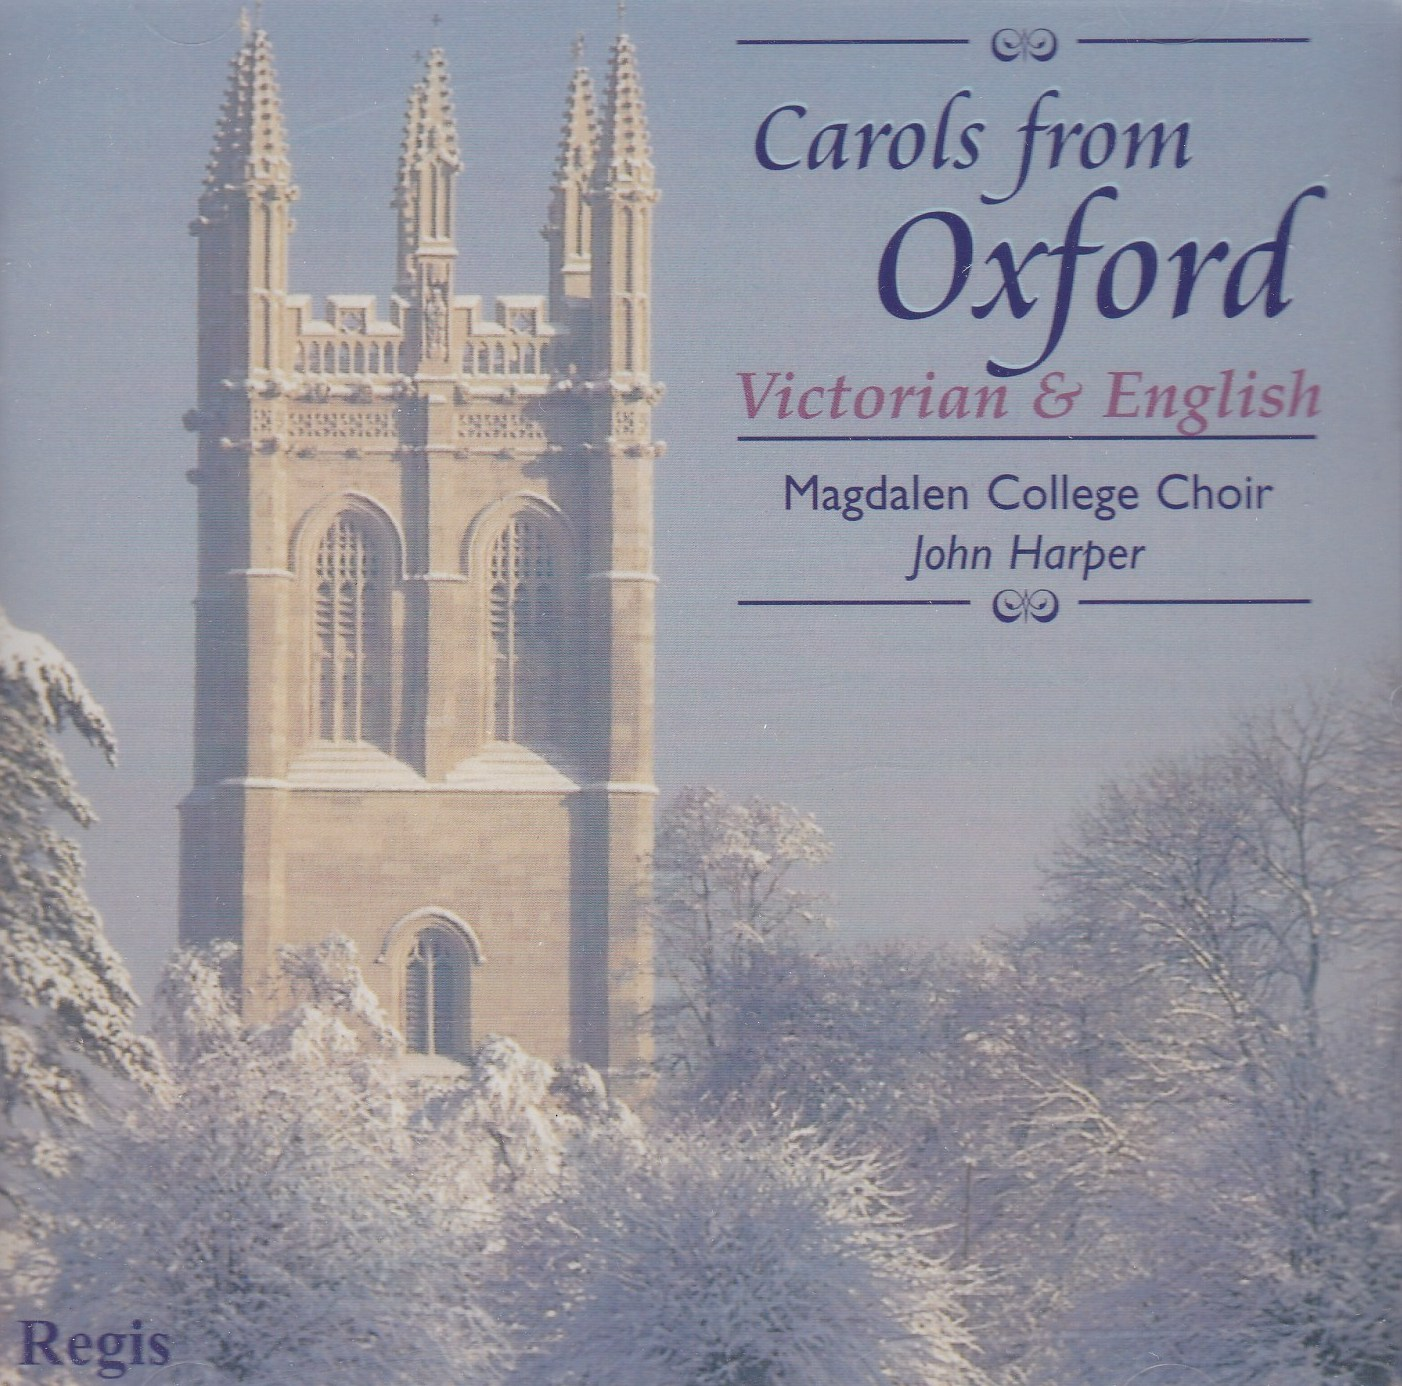 Carols from Oxford